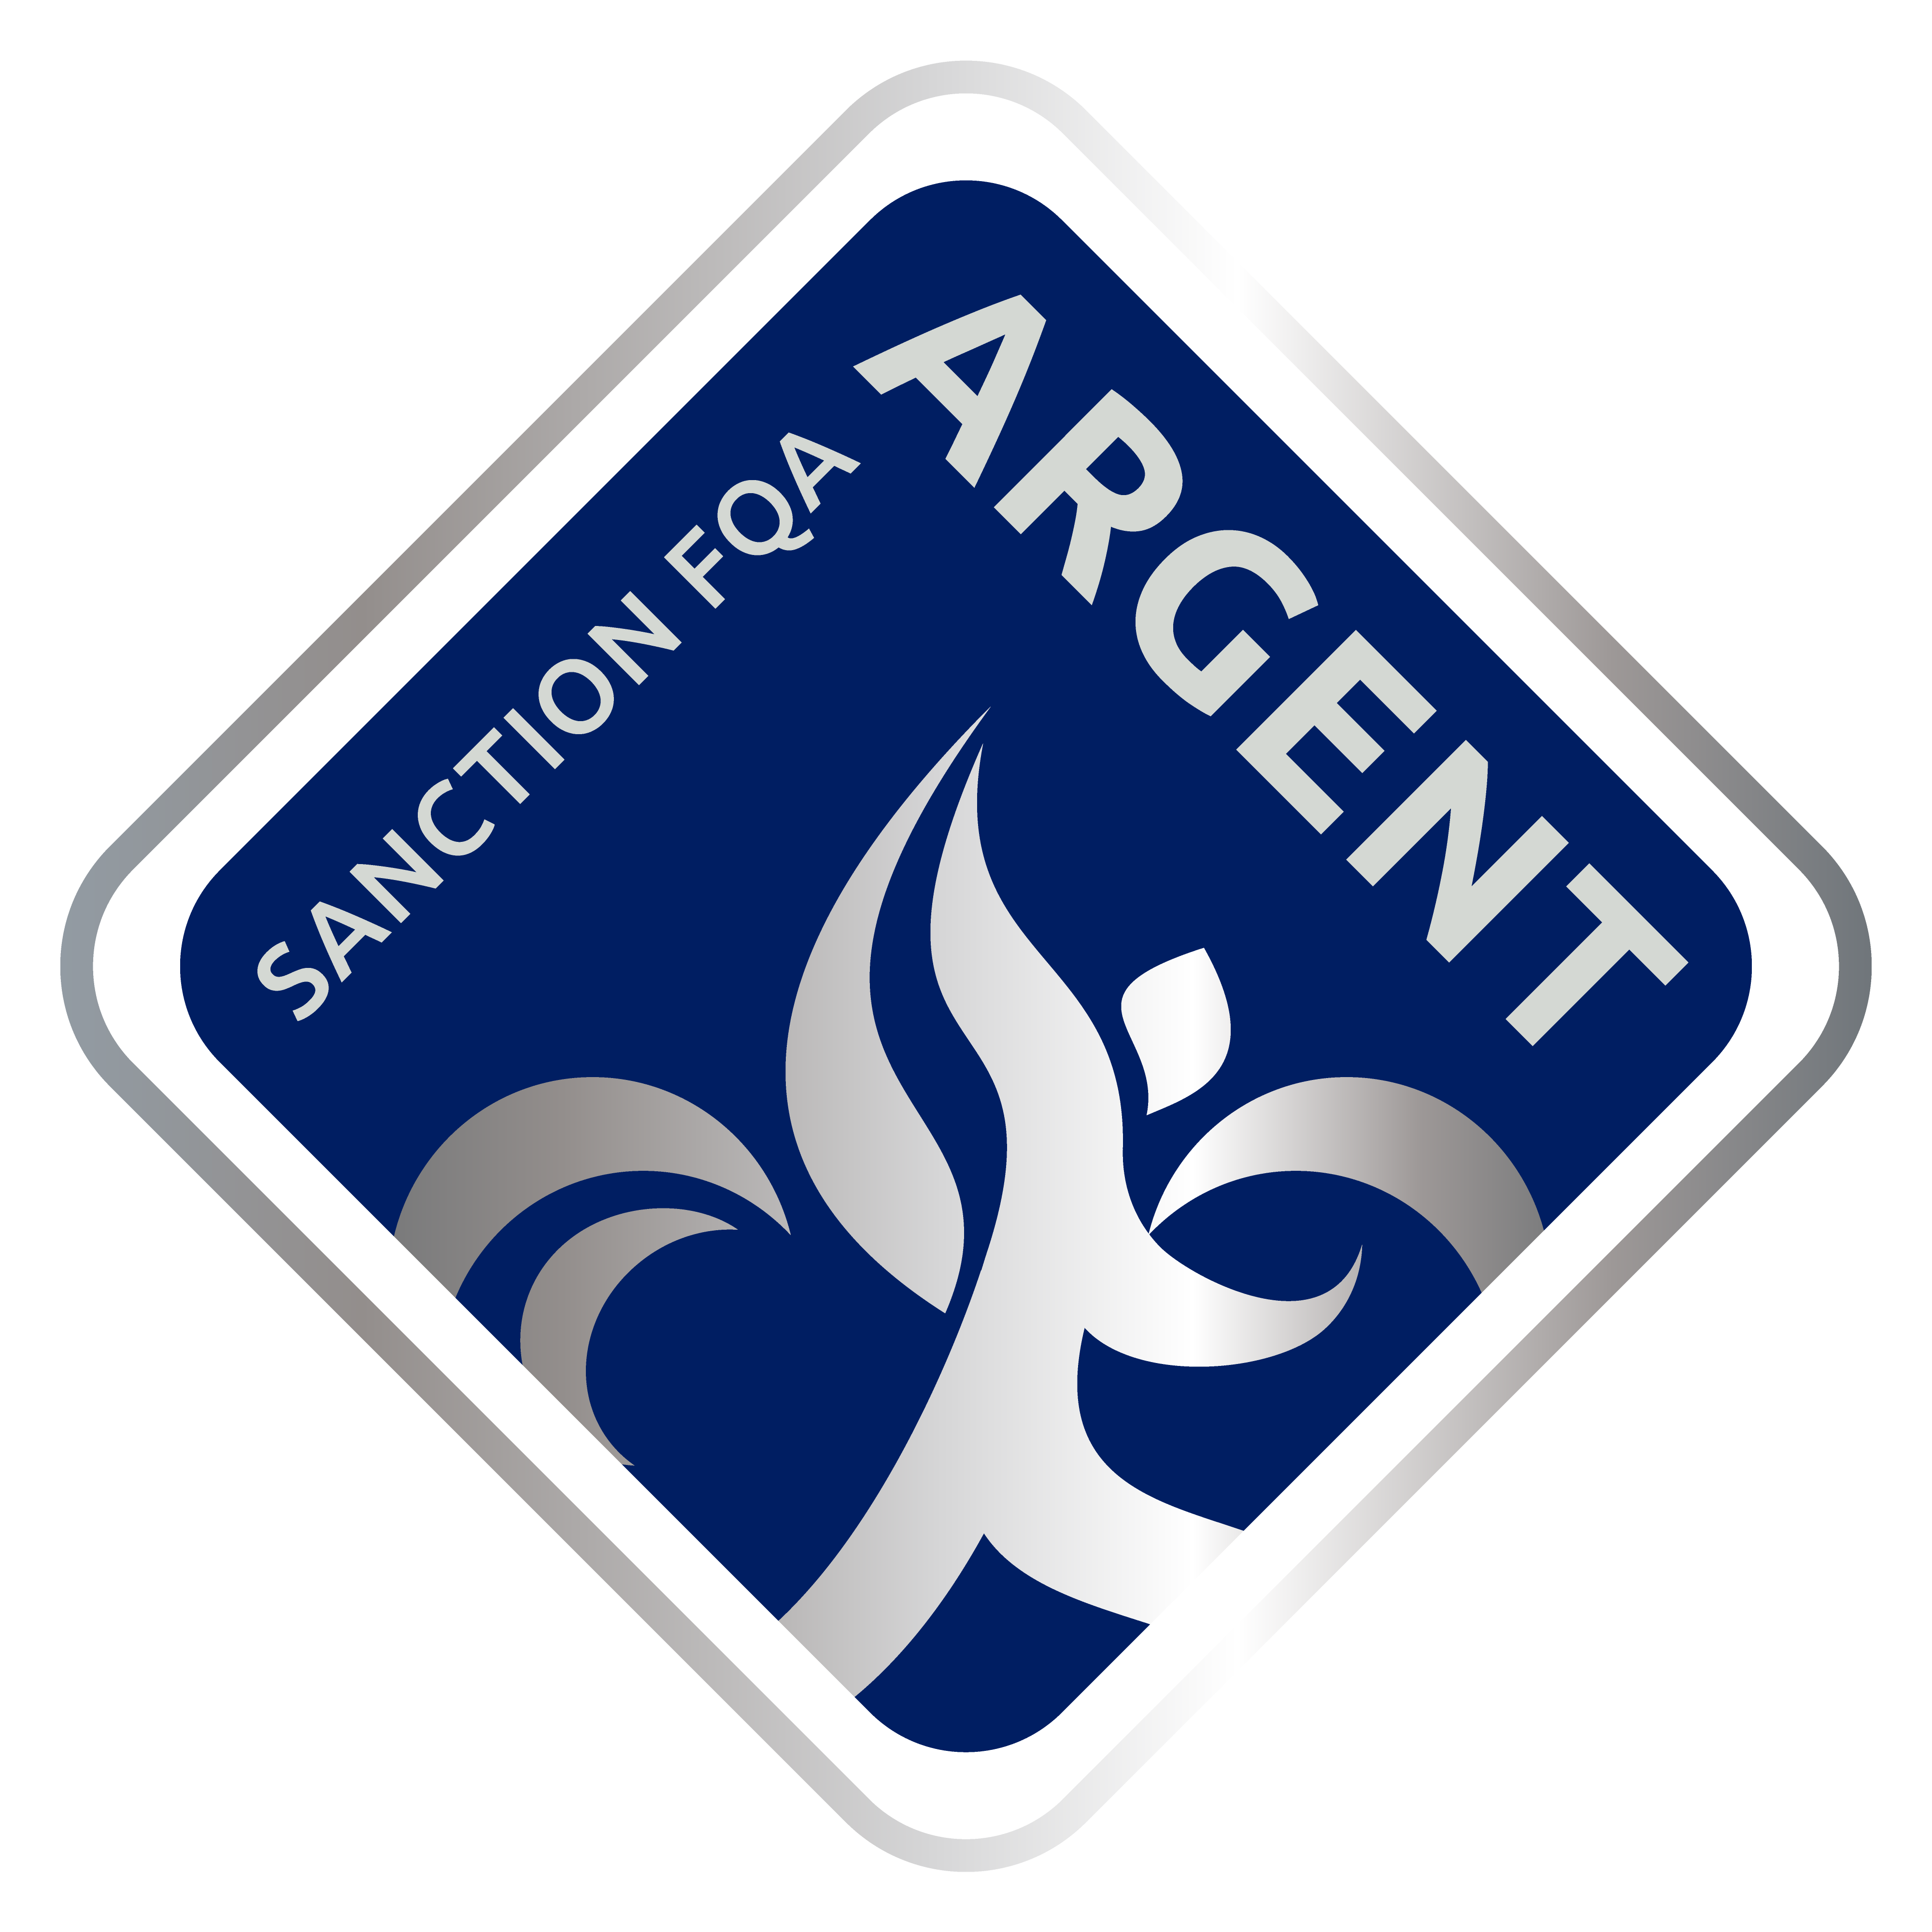 Logo - Fédération Québécoise d'Athlétisme DML (fr)